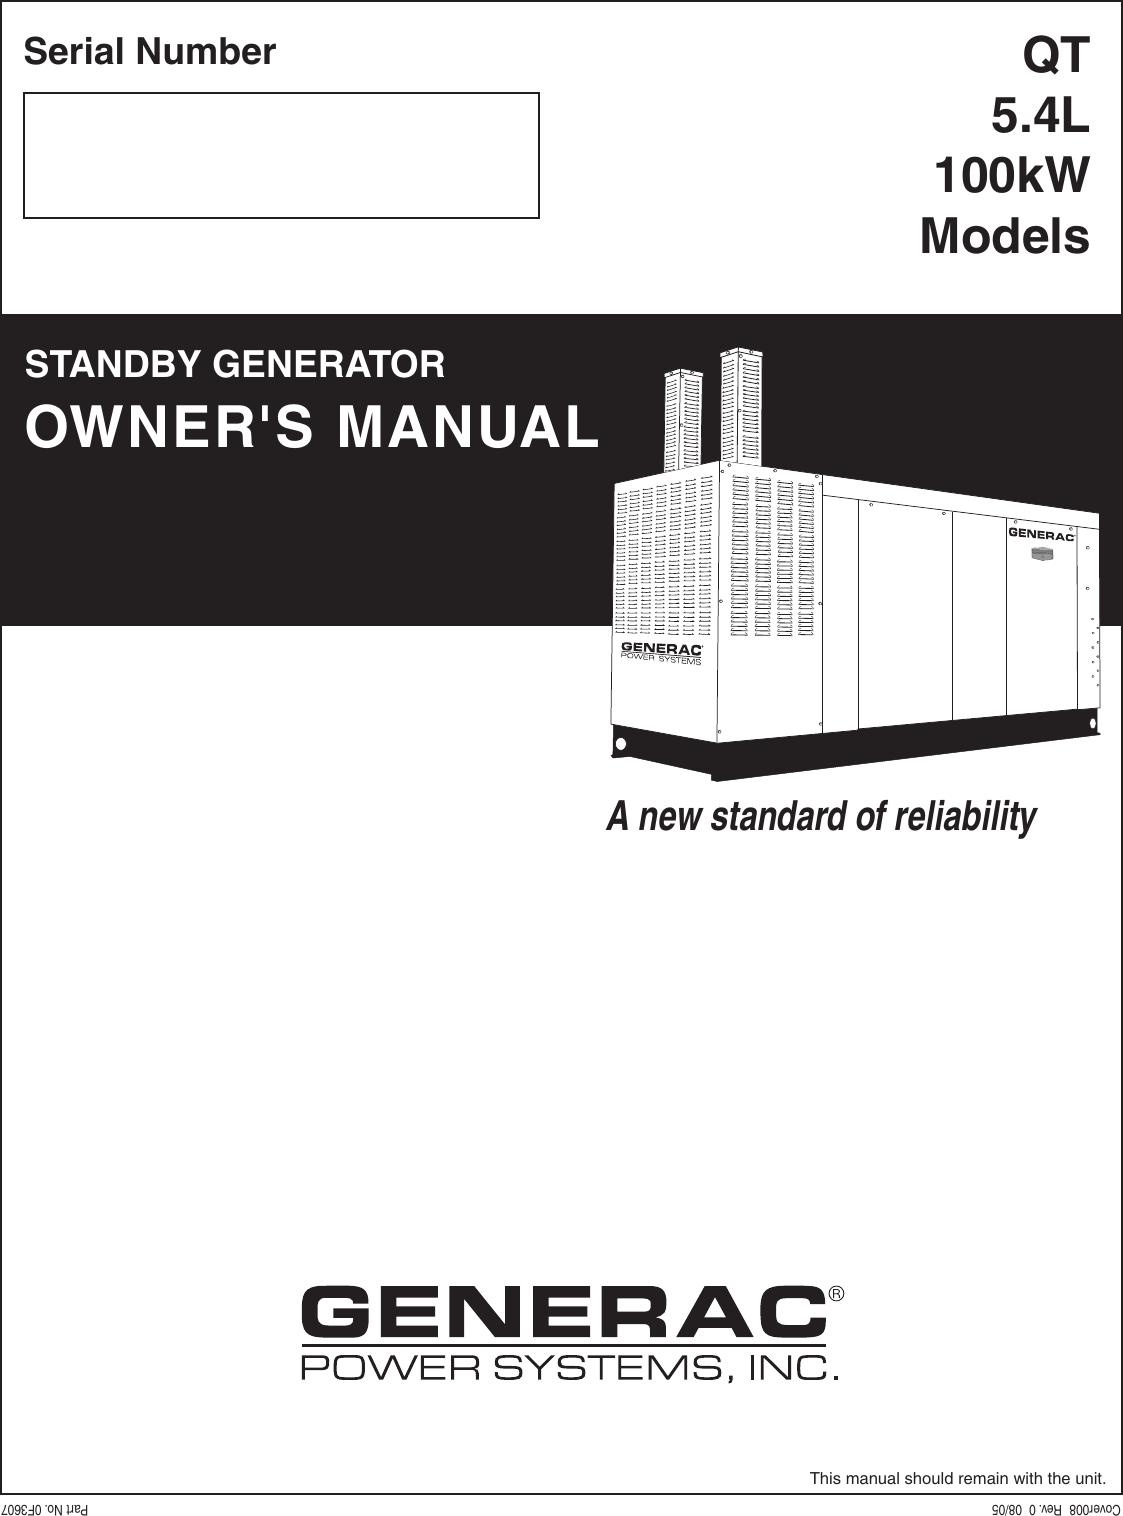 Generac Brushless Generator Wiring Diagram Diagrams Data Base Model 0059430 Source Qt 5 4l Owners Manual Cover008 Rev0 8 05 Rh Usermanual Wiki On Wheelhouse